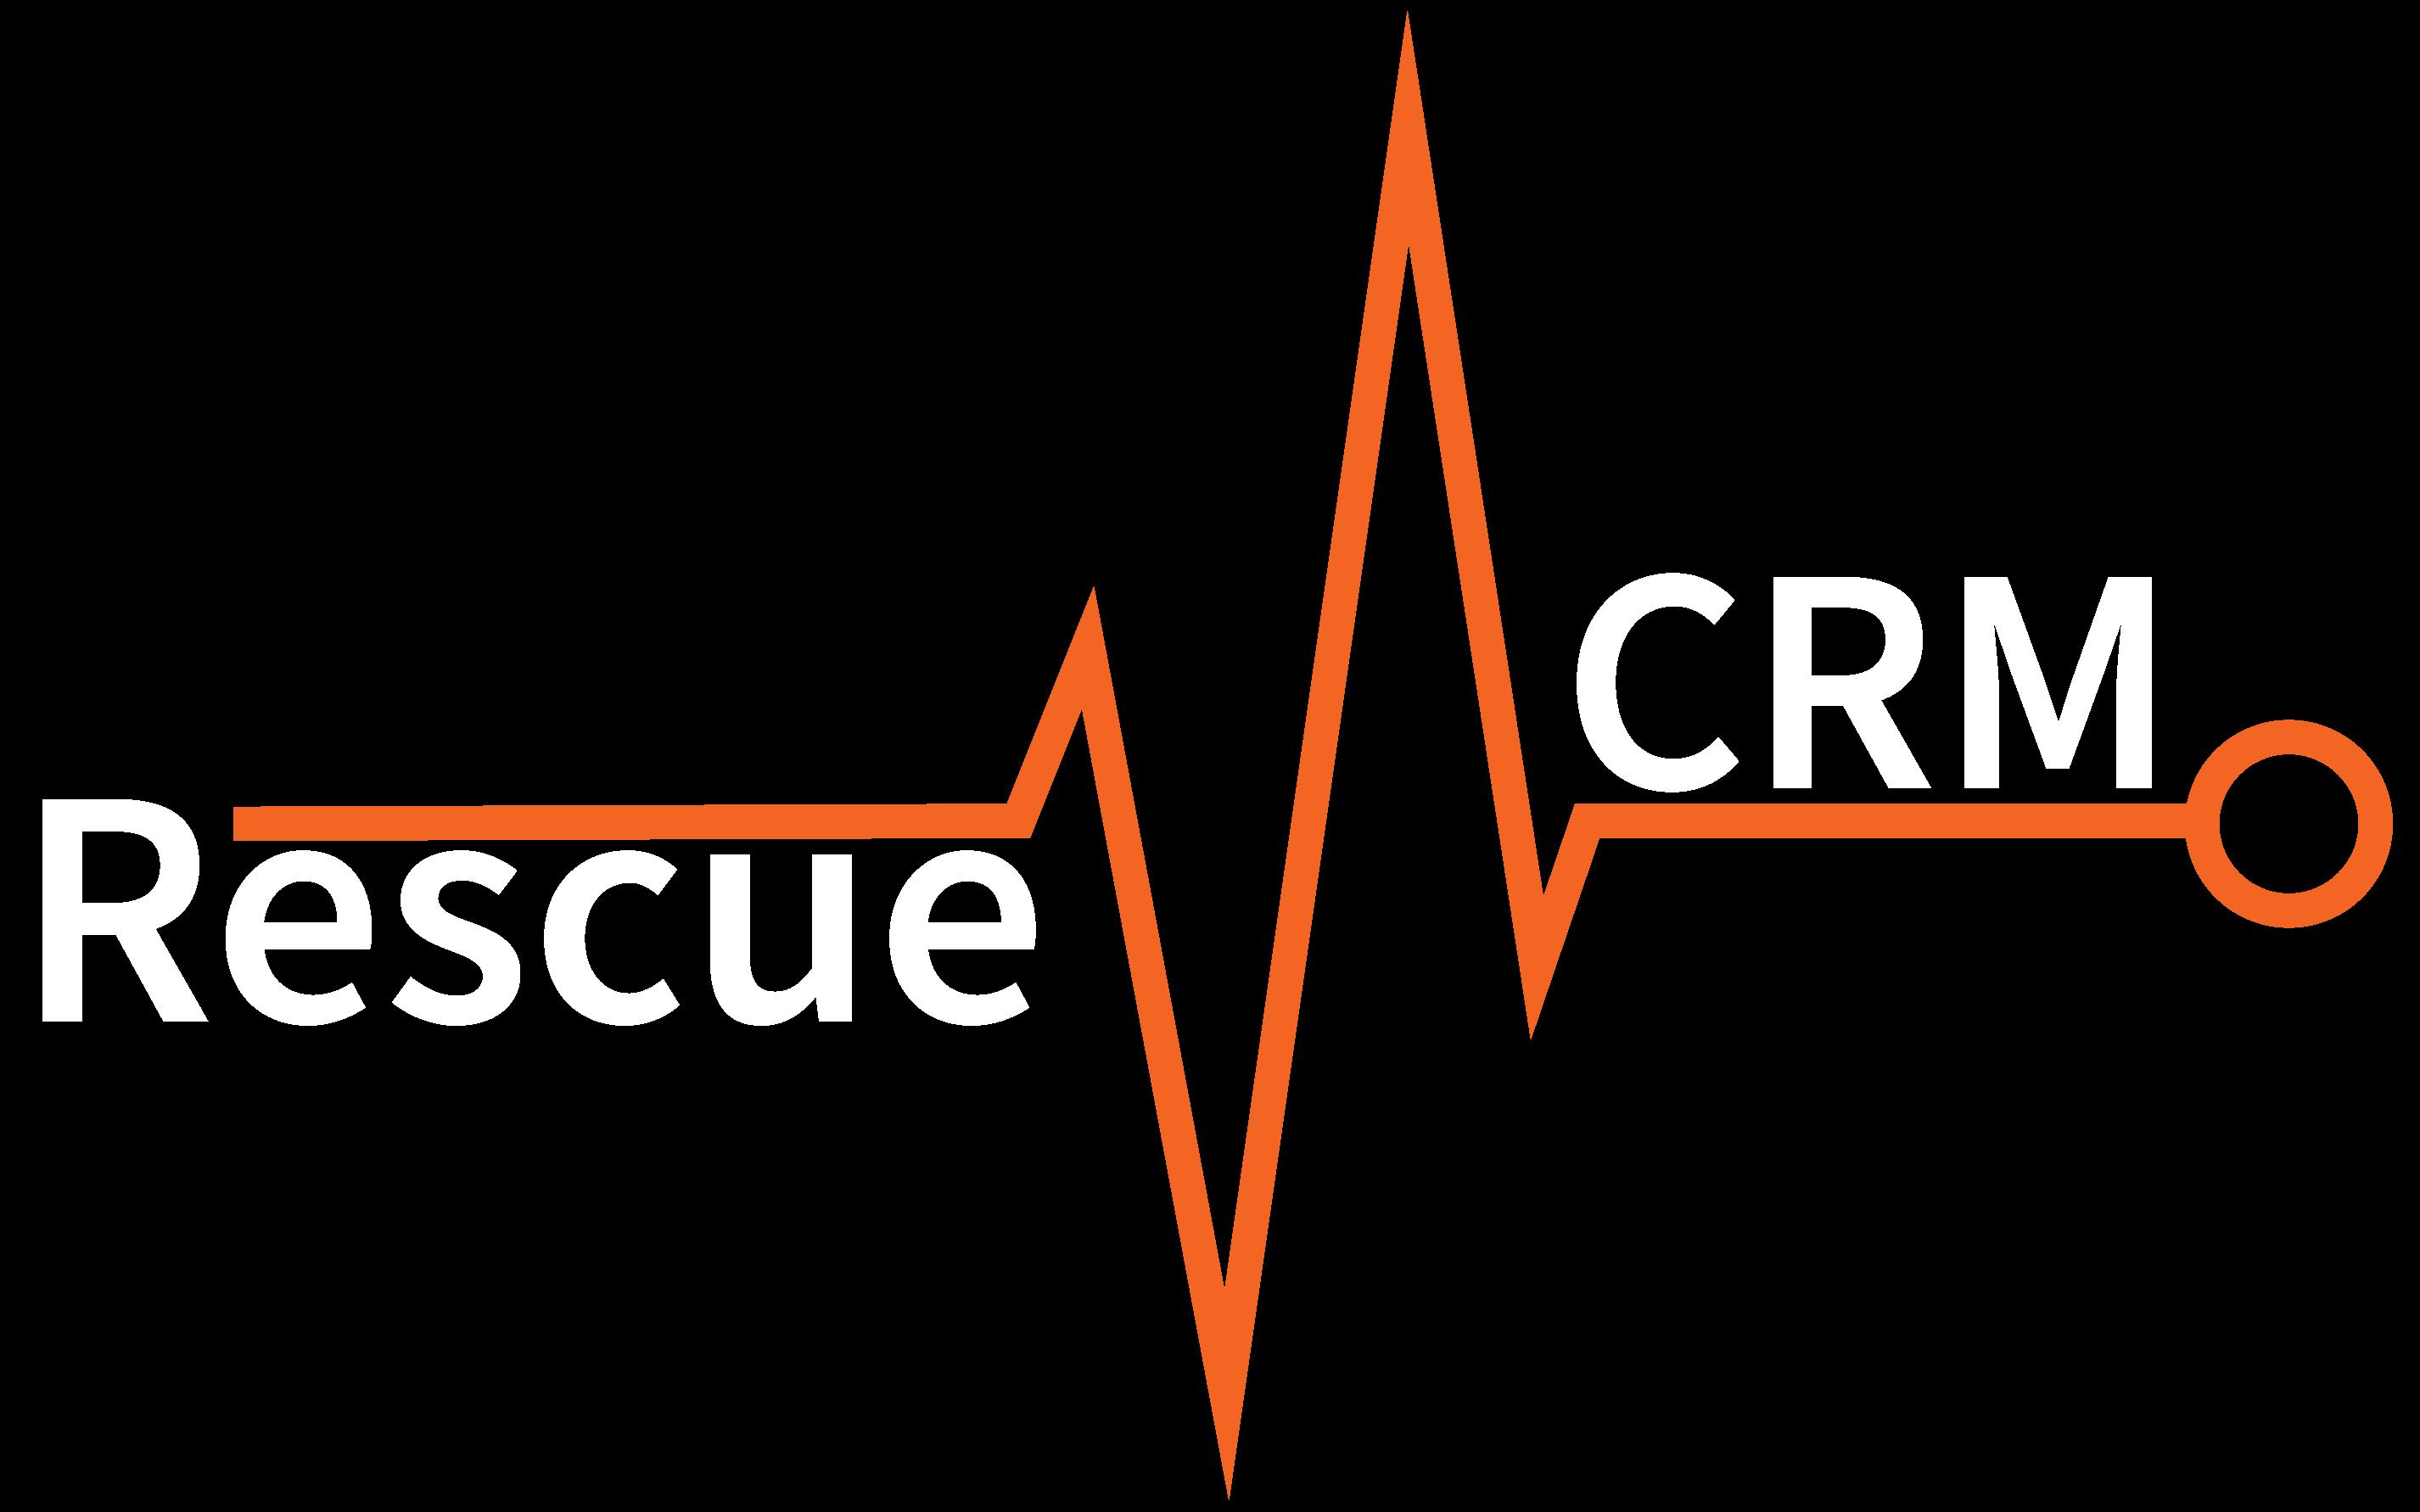 Rescue CRM